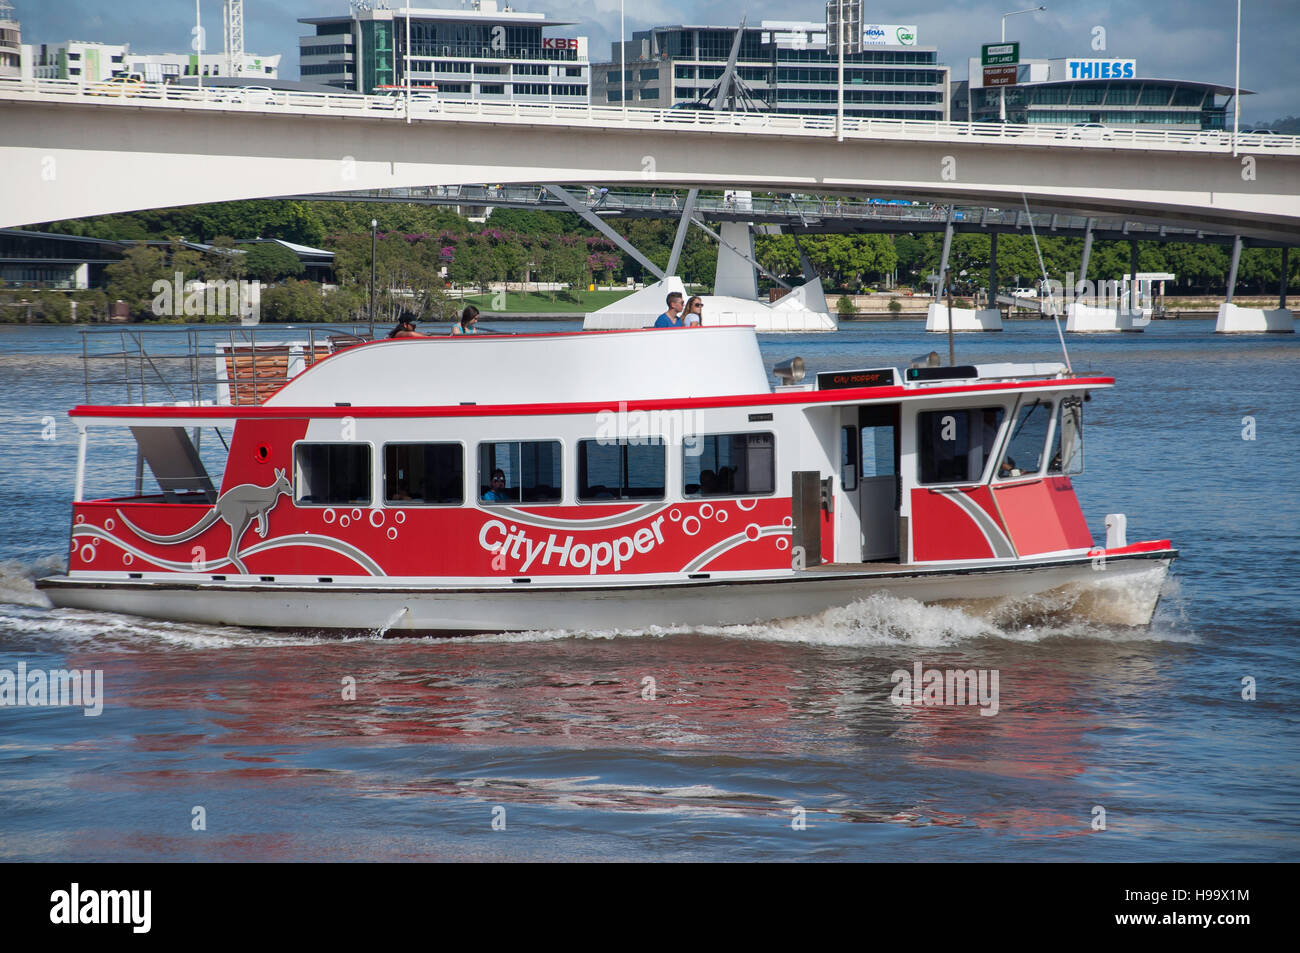 CityHopper ferry boat on Brisbane River, Brisbane City, Brisbane, Queensland, Australia - Stock Image